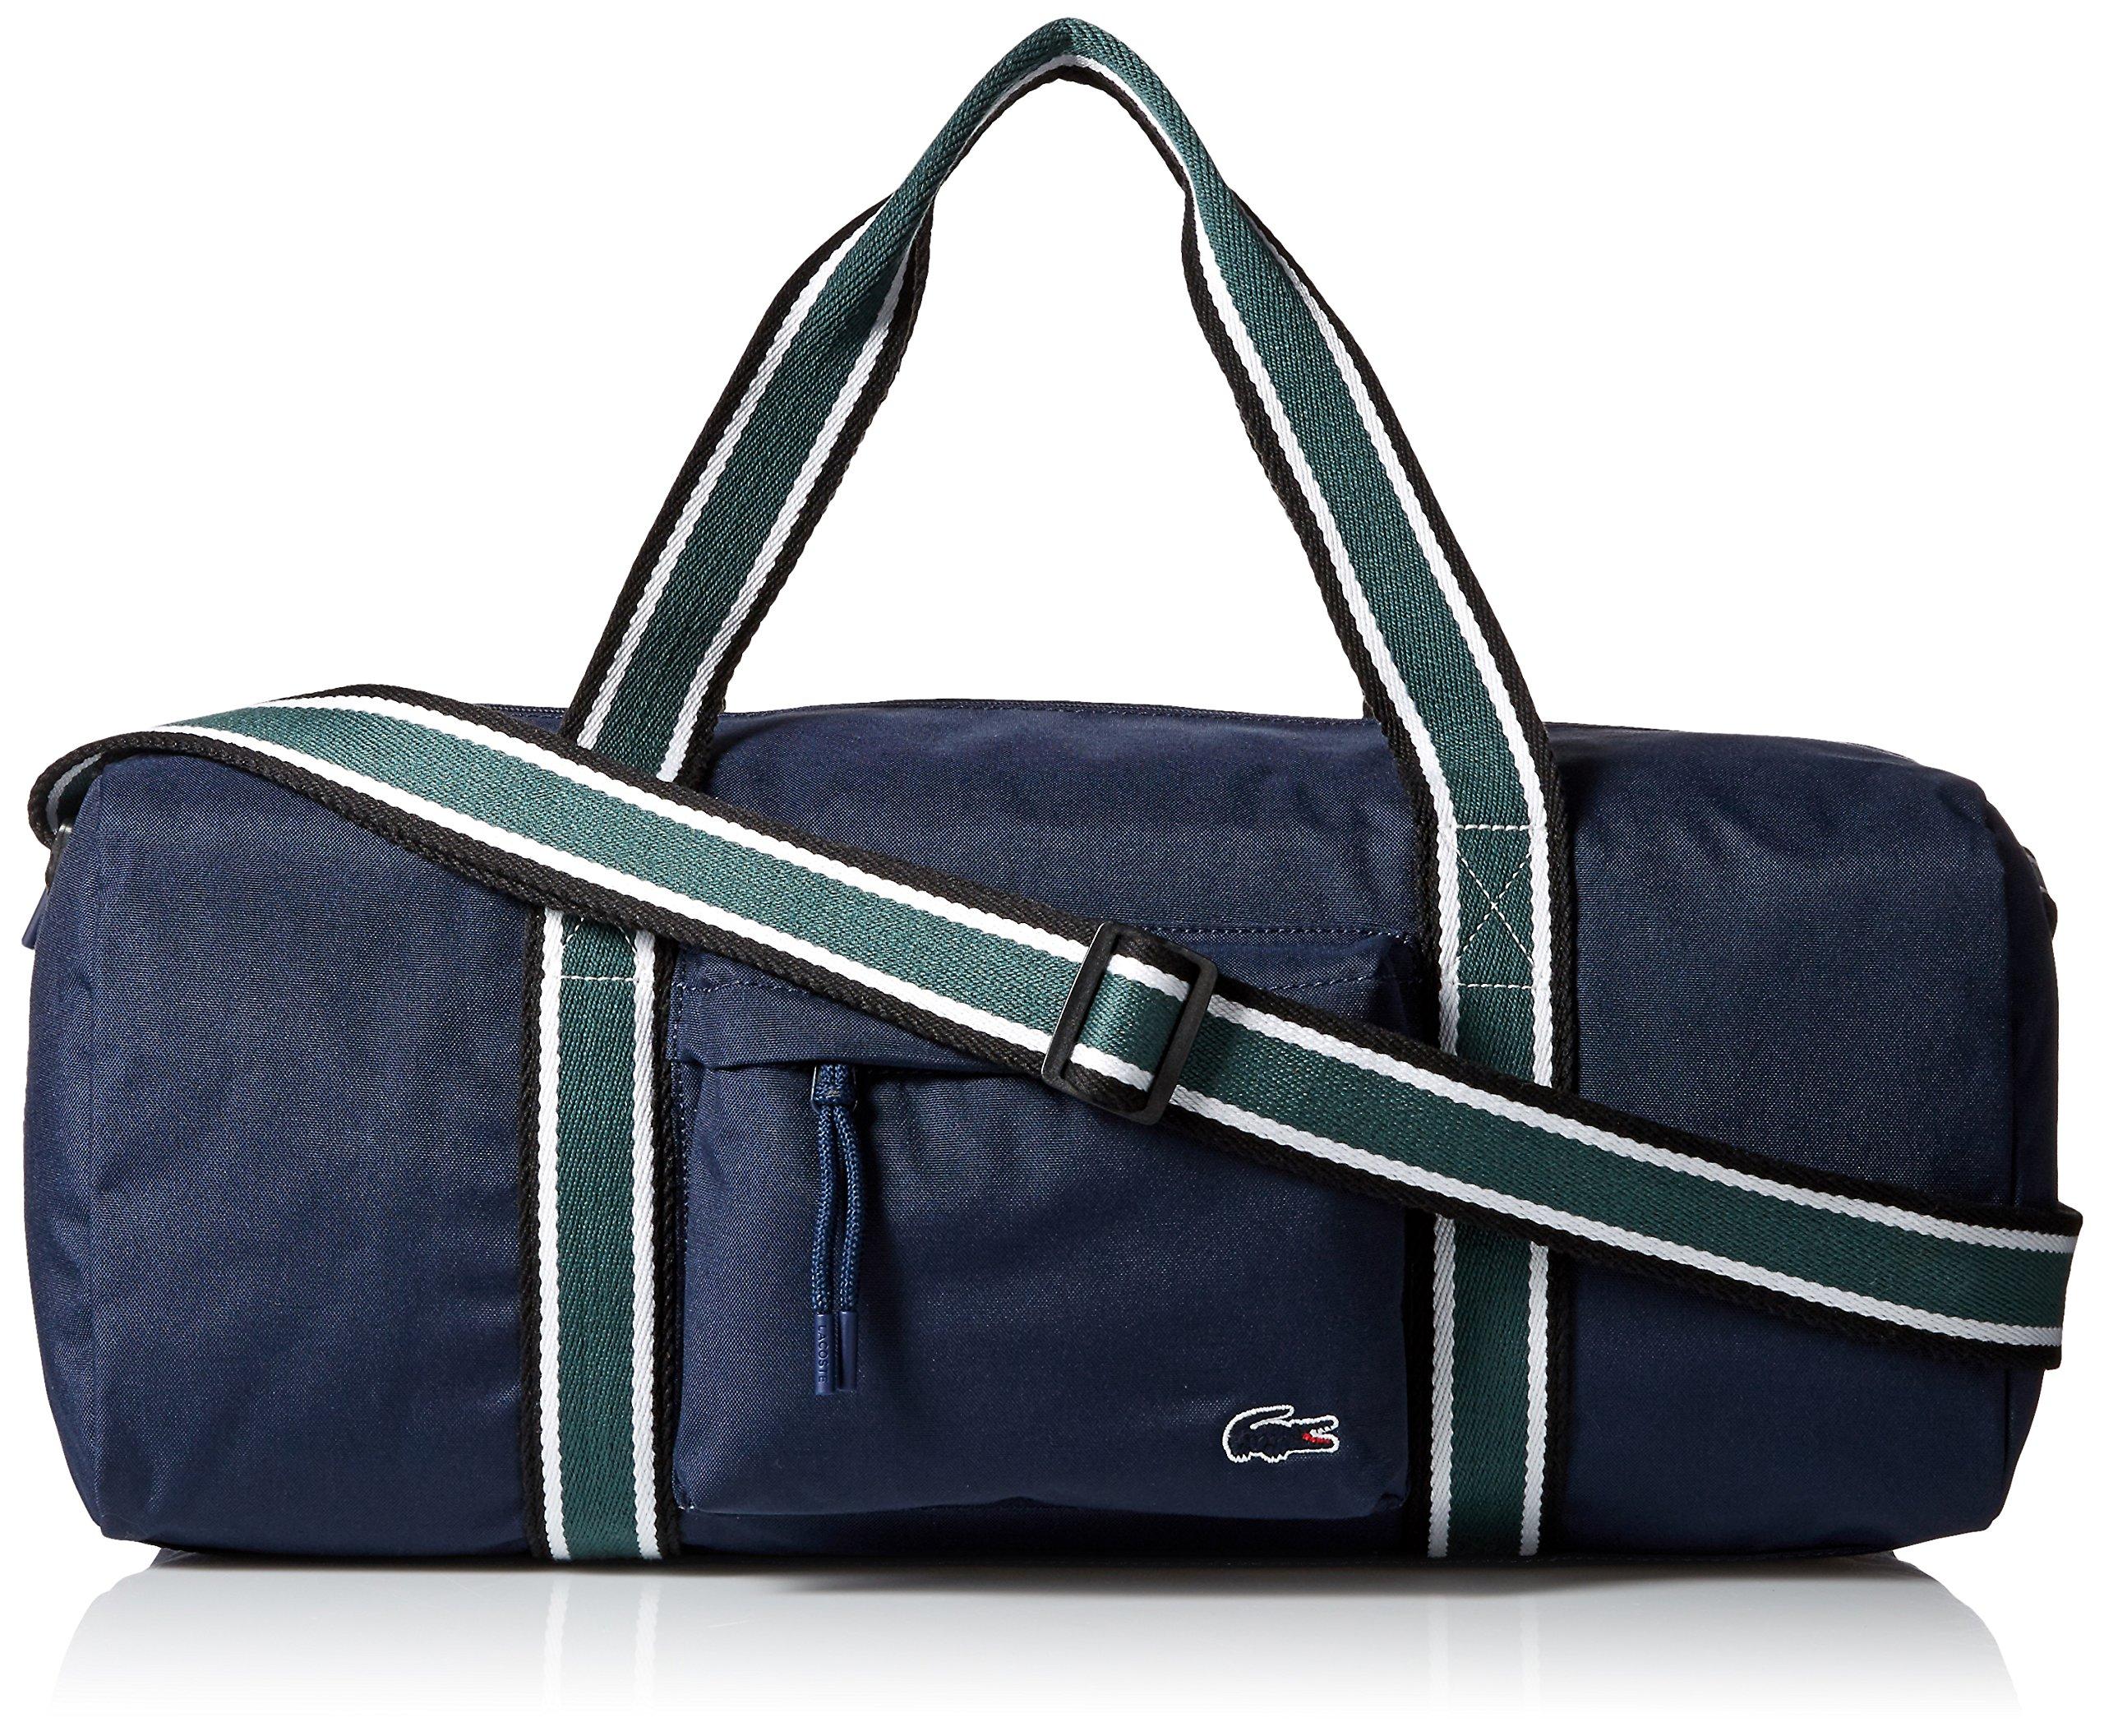 Lacoste Men's Tennis Set Duffle Bag, Peacoat Sinople Stripe, One Size